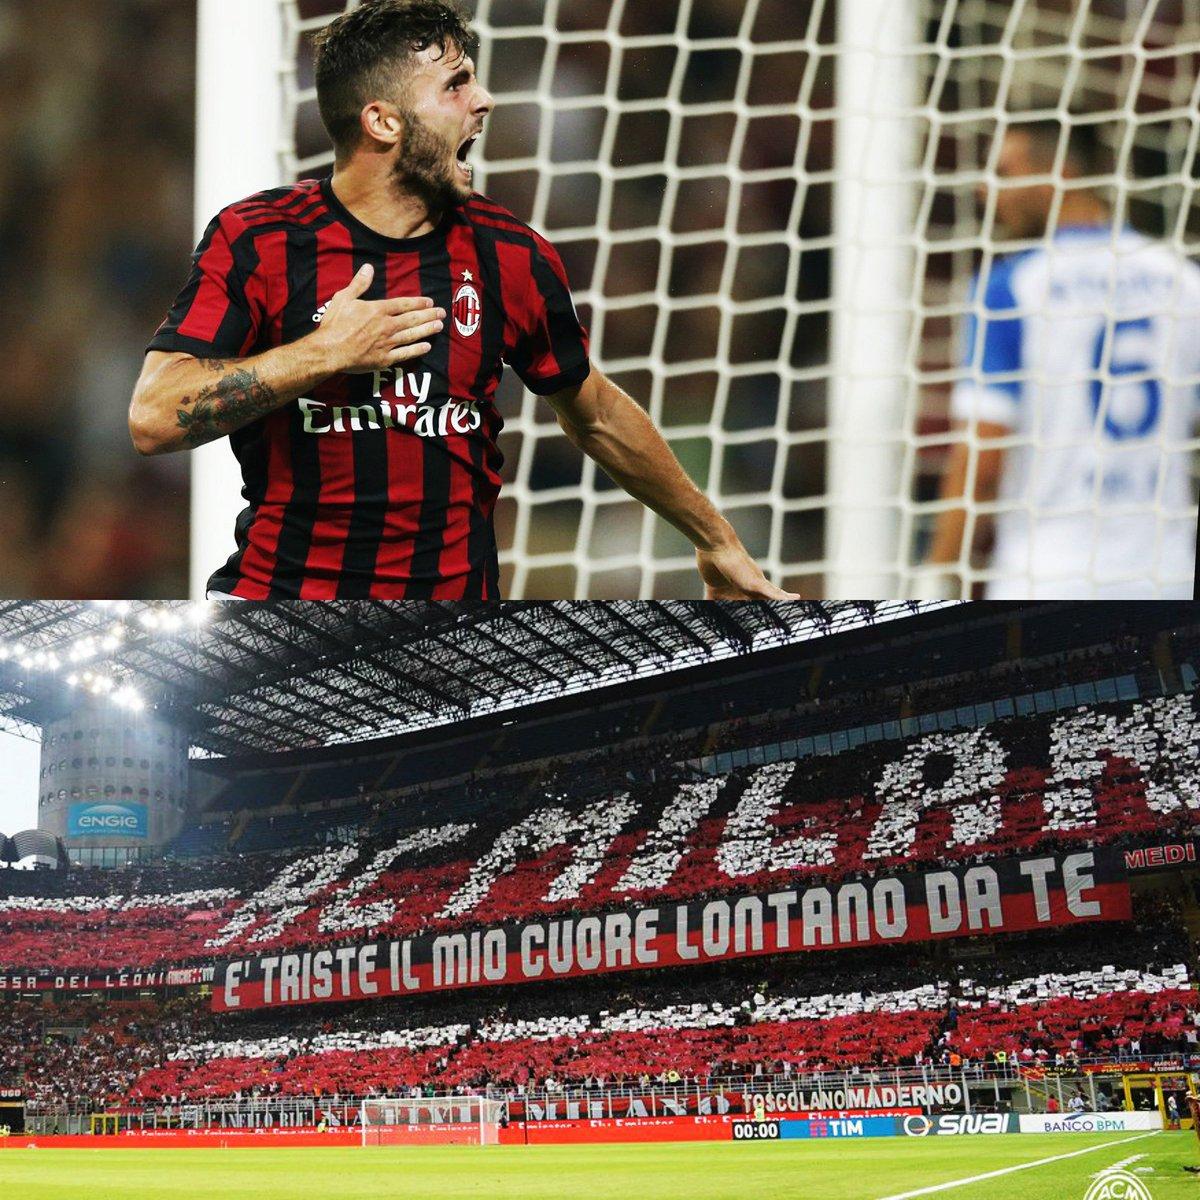 Milan-Craiova 2-0, tabellino e analisi di Montella | UEFA Europa League